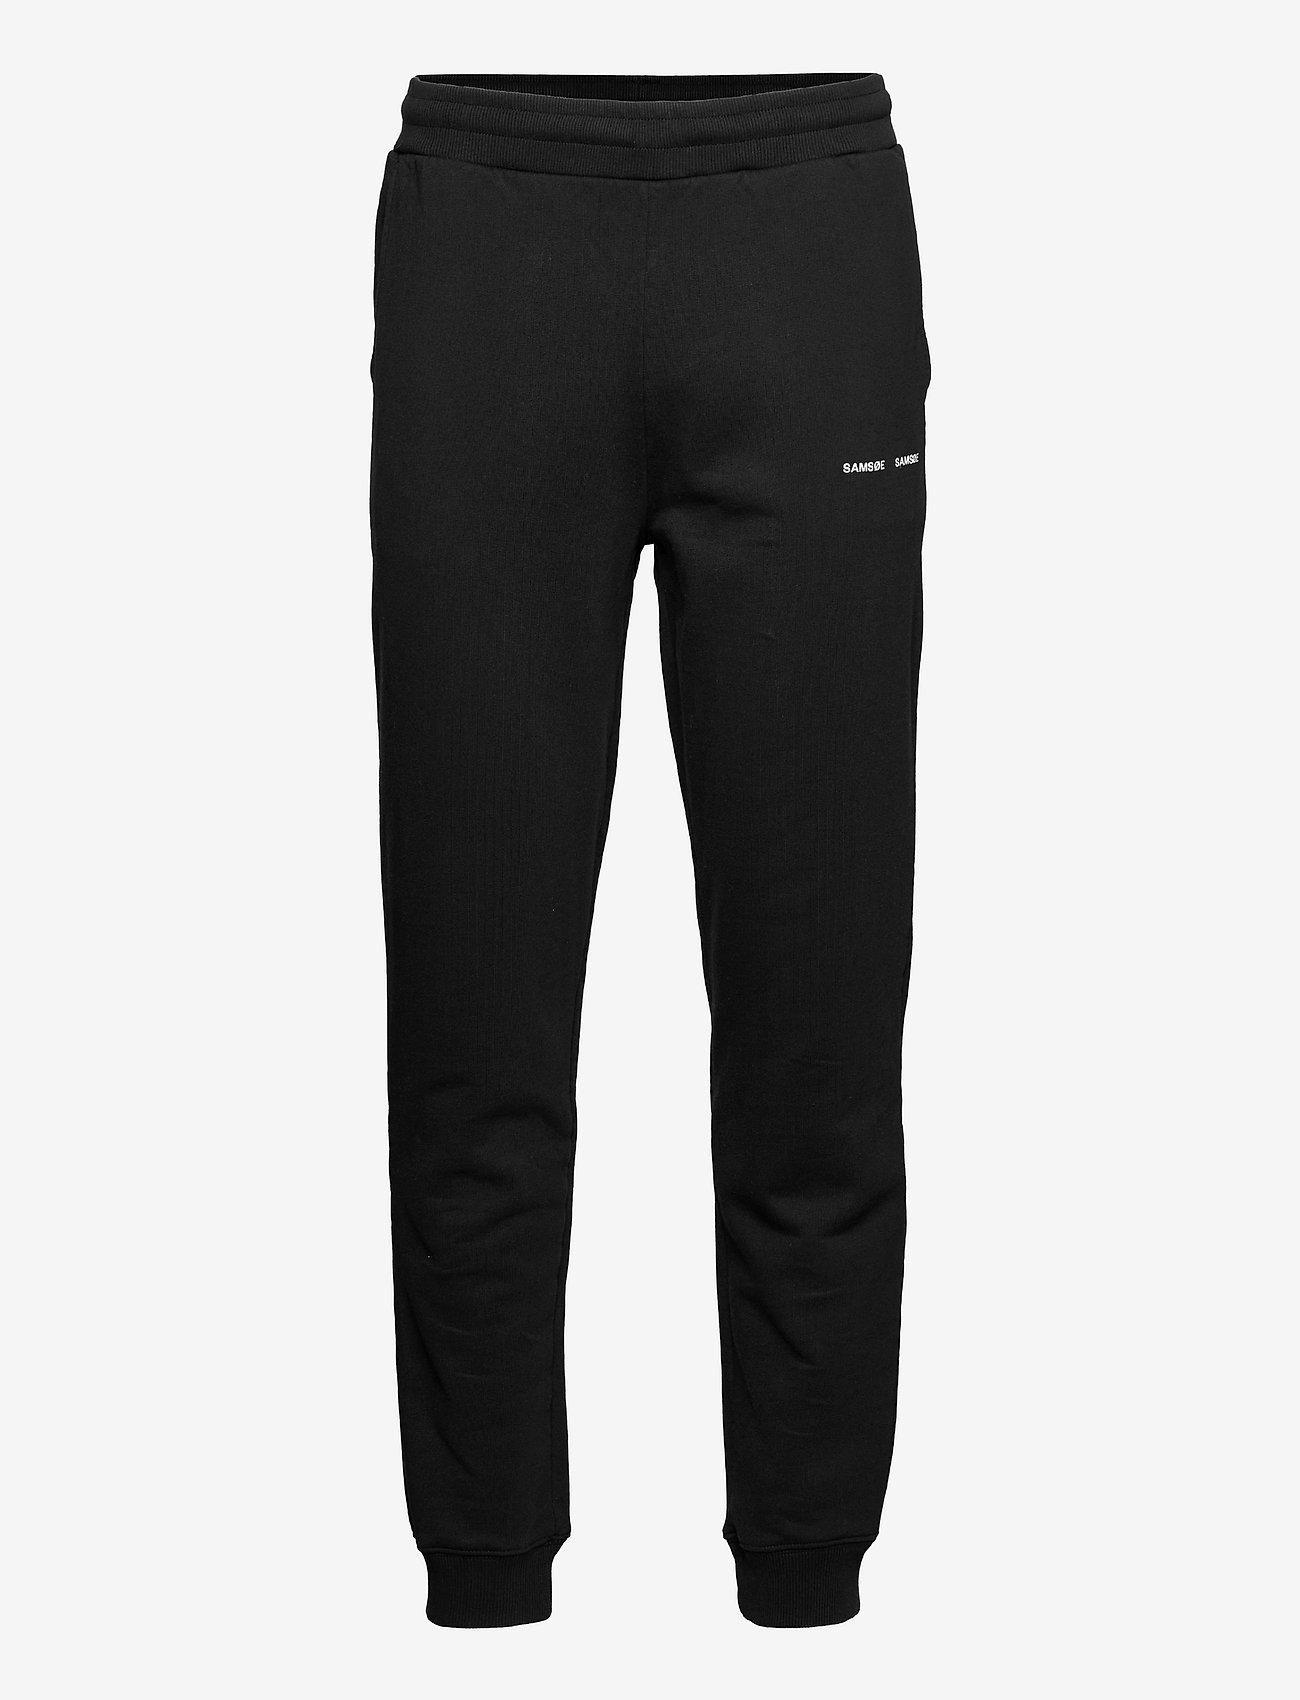 Samsøe Samsøe - Norsbro trousers 11720 - kleding - black - 0